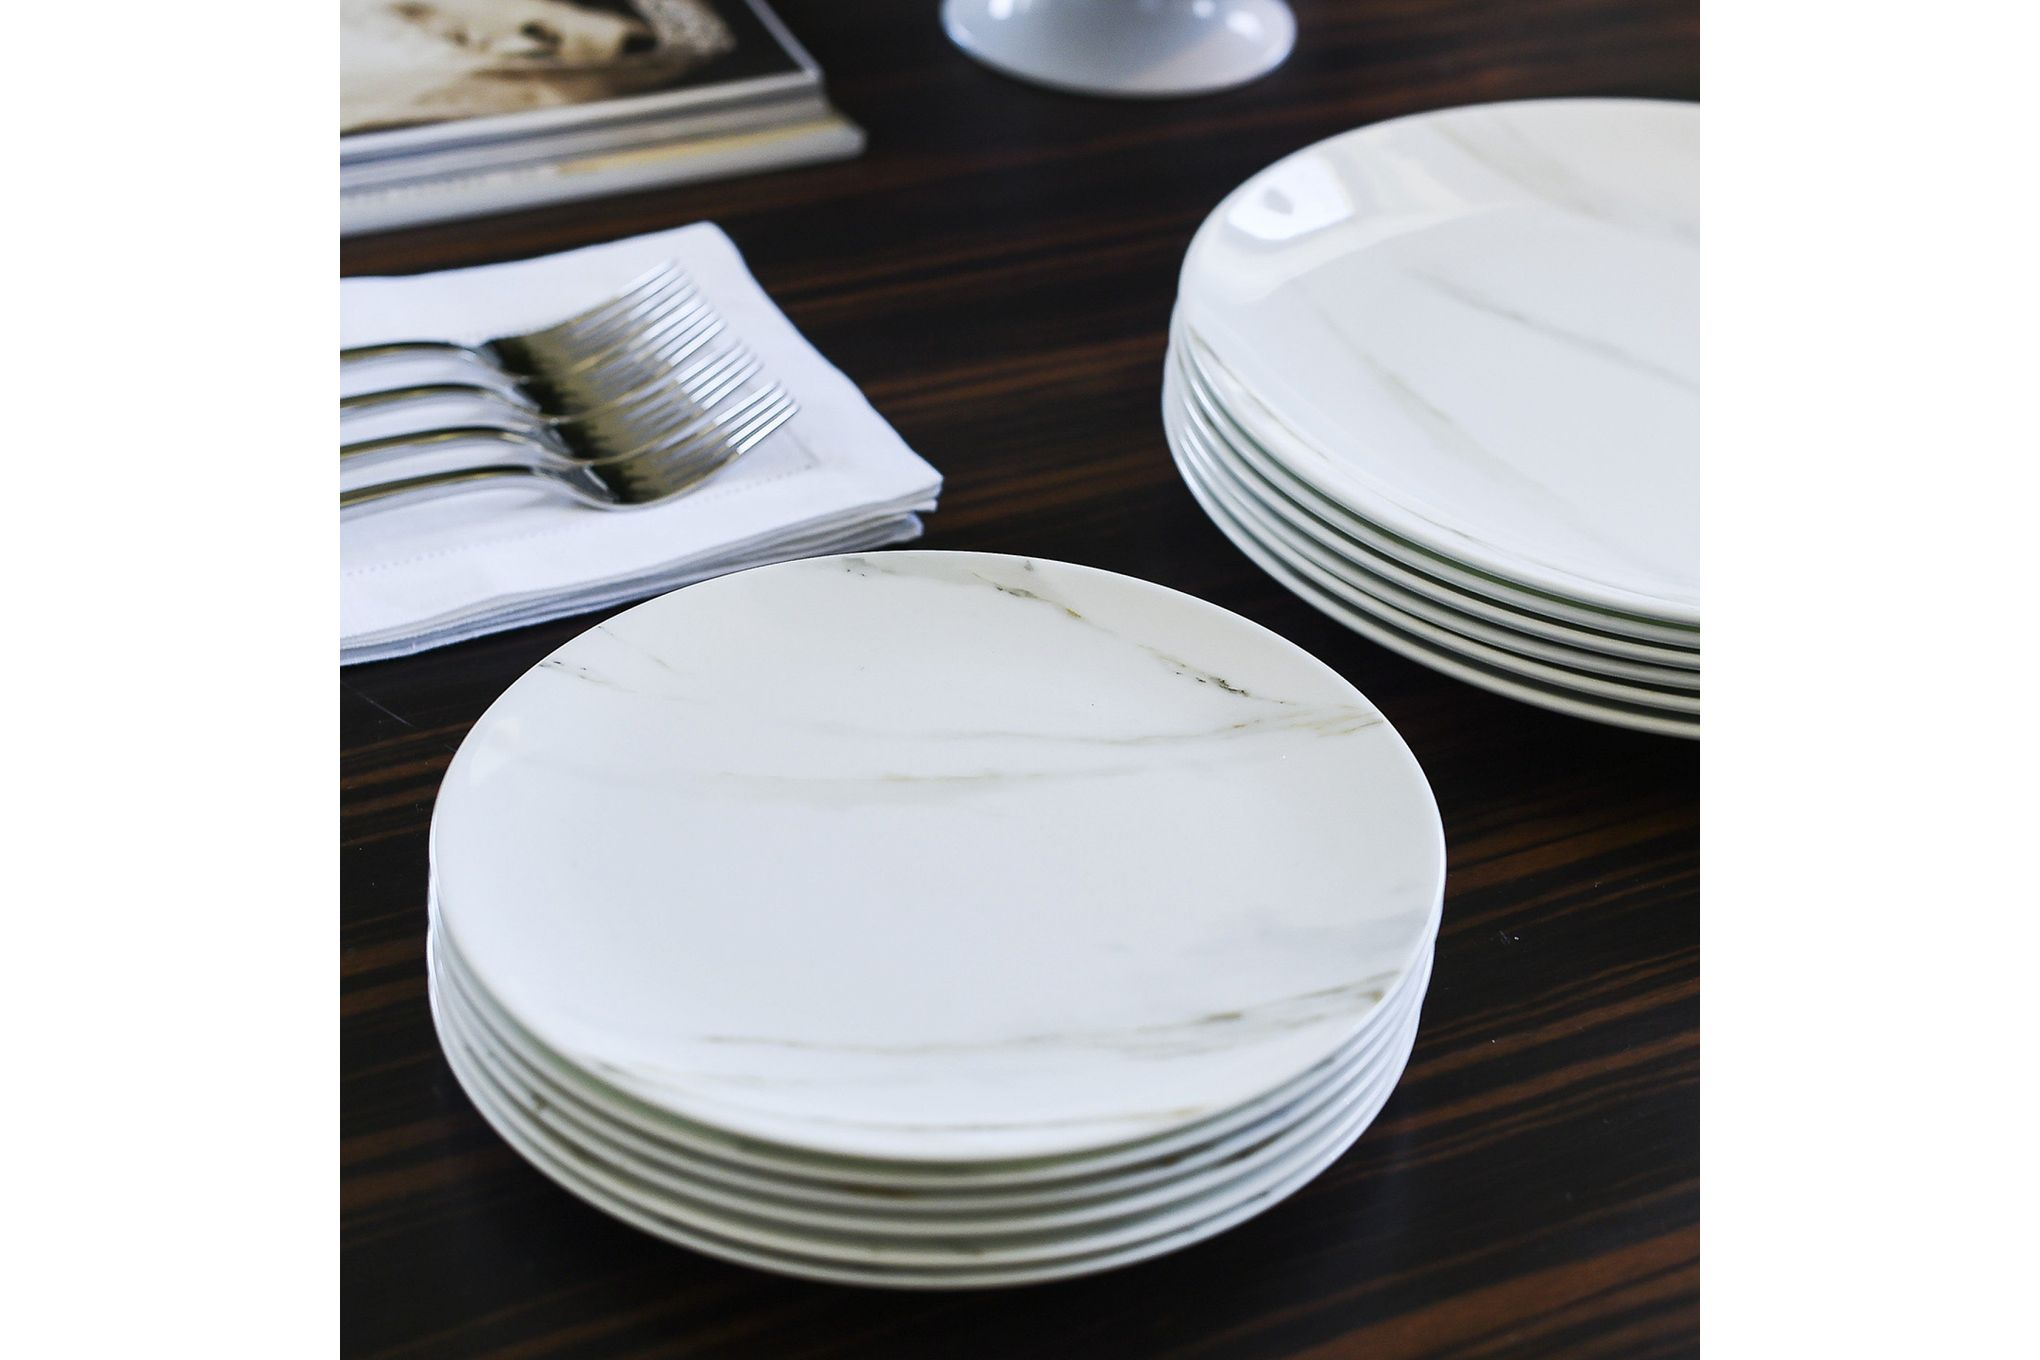 Vera Wang for Wedgwood Venato Imperial Breakfast Plate 23cm thumb 2